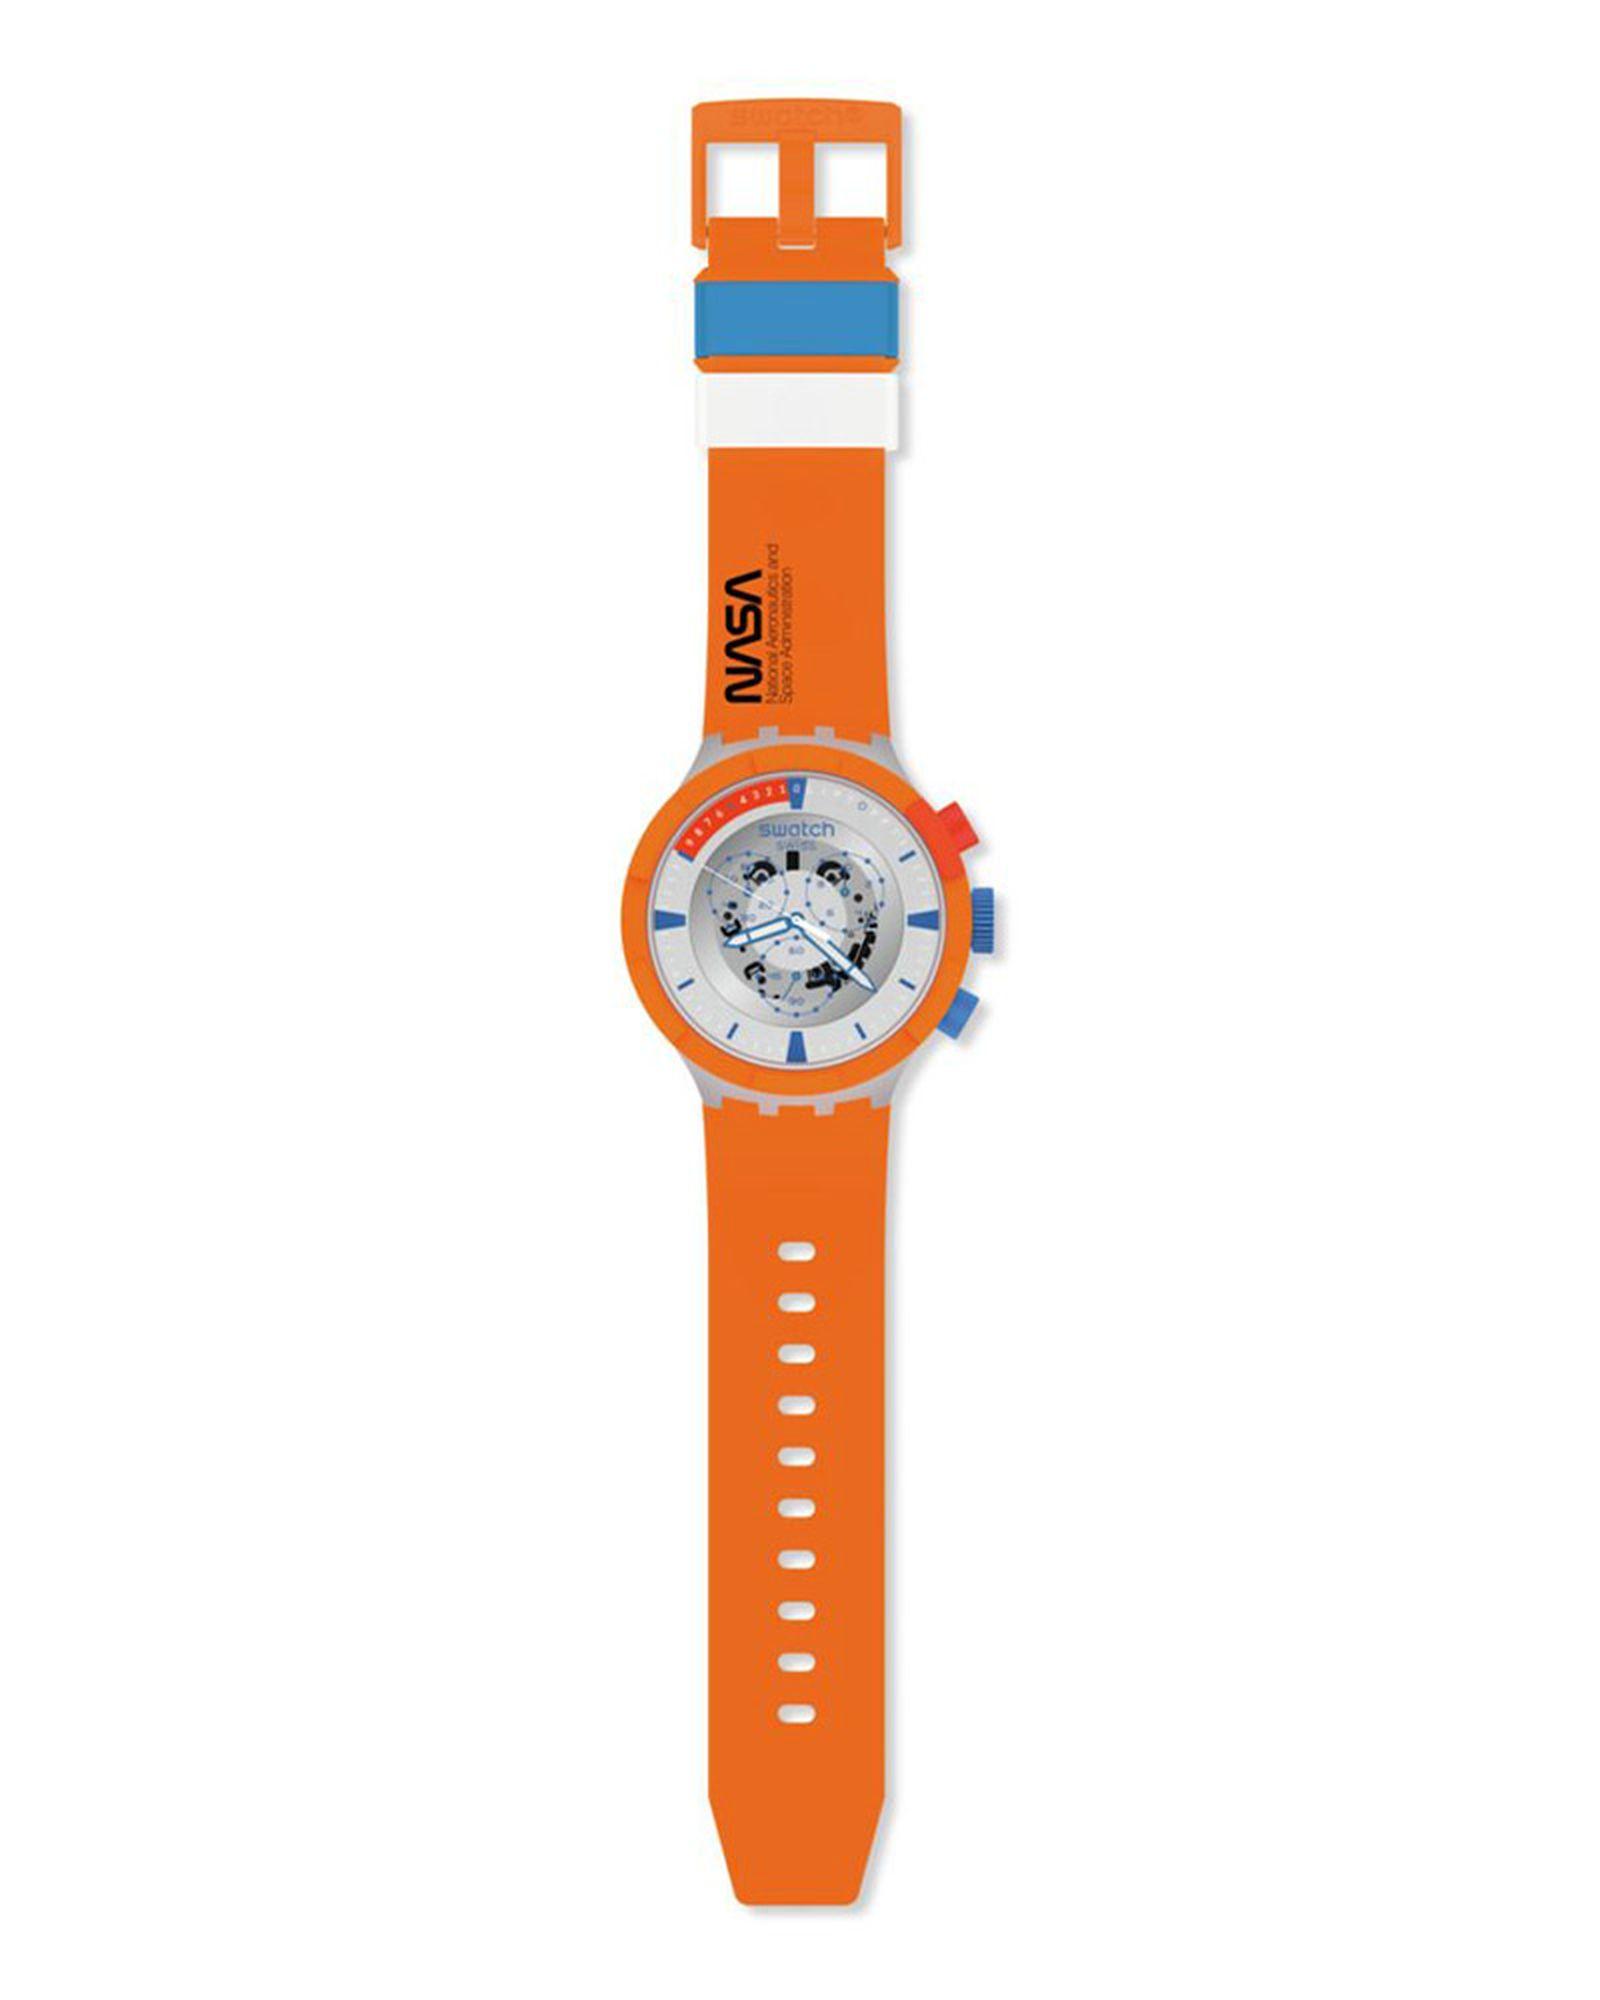 swatch-nasa-watch-04